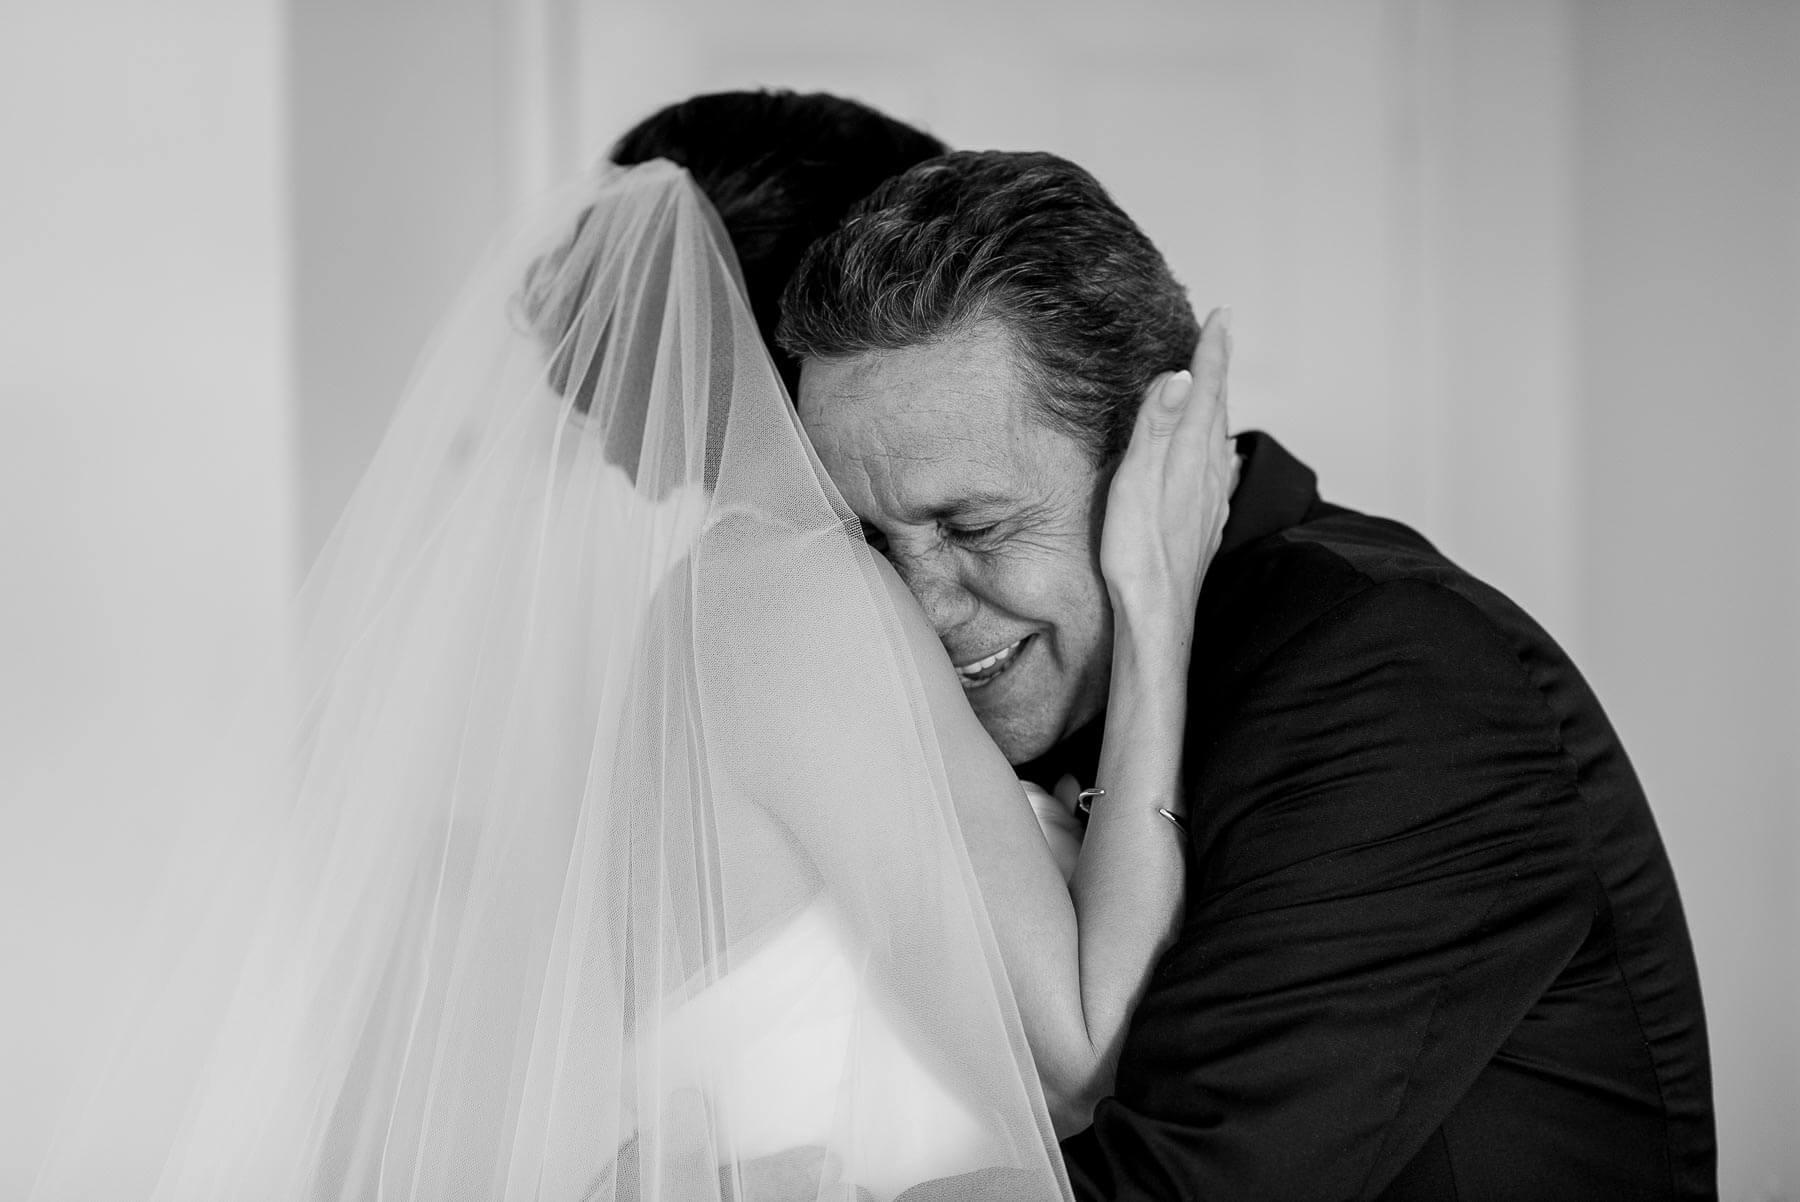 Bride embraces father - photo by Maloman Studios